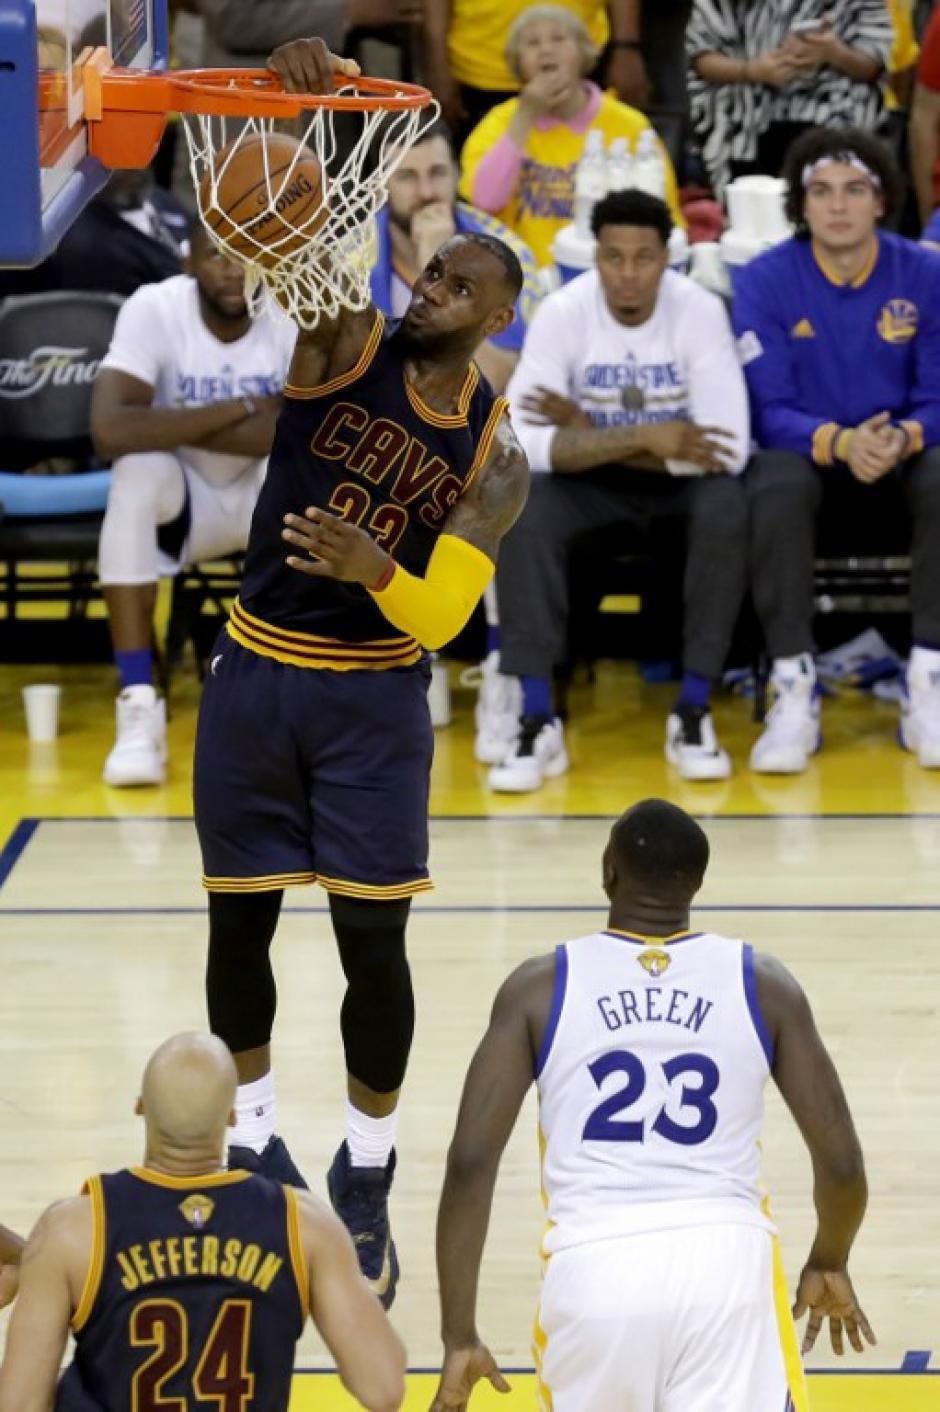 LeBron James está disputando la final de la NBA. (Foto: AFP)